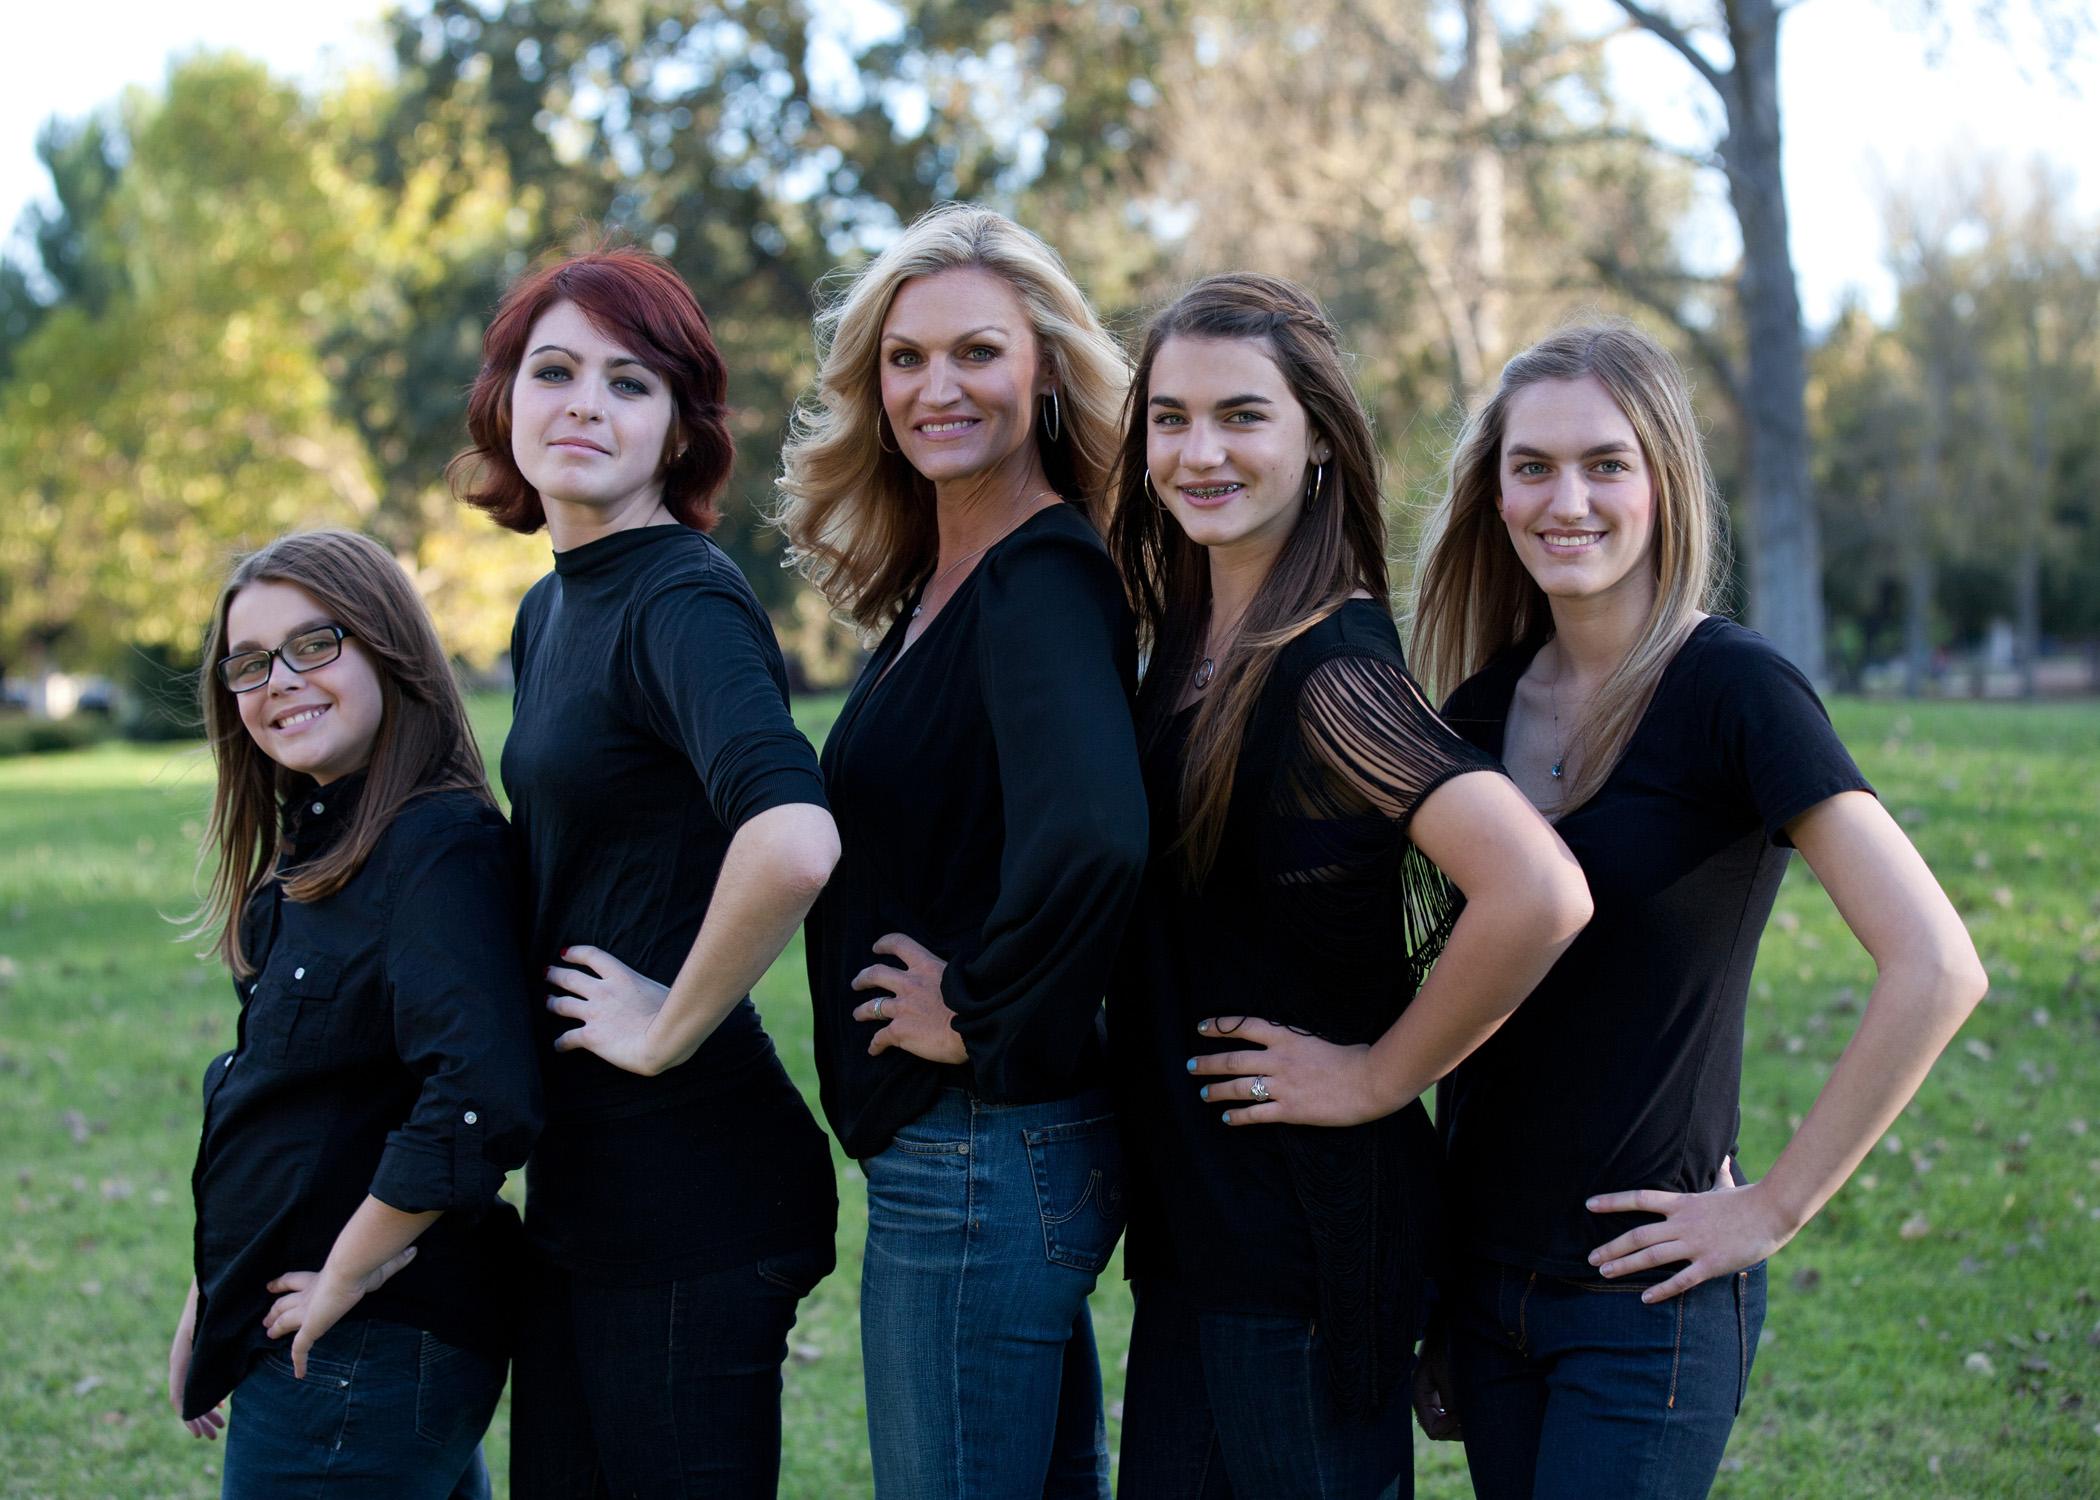 family portrait all 5 girls hands on hips